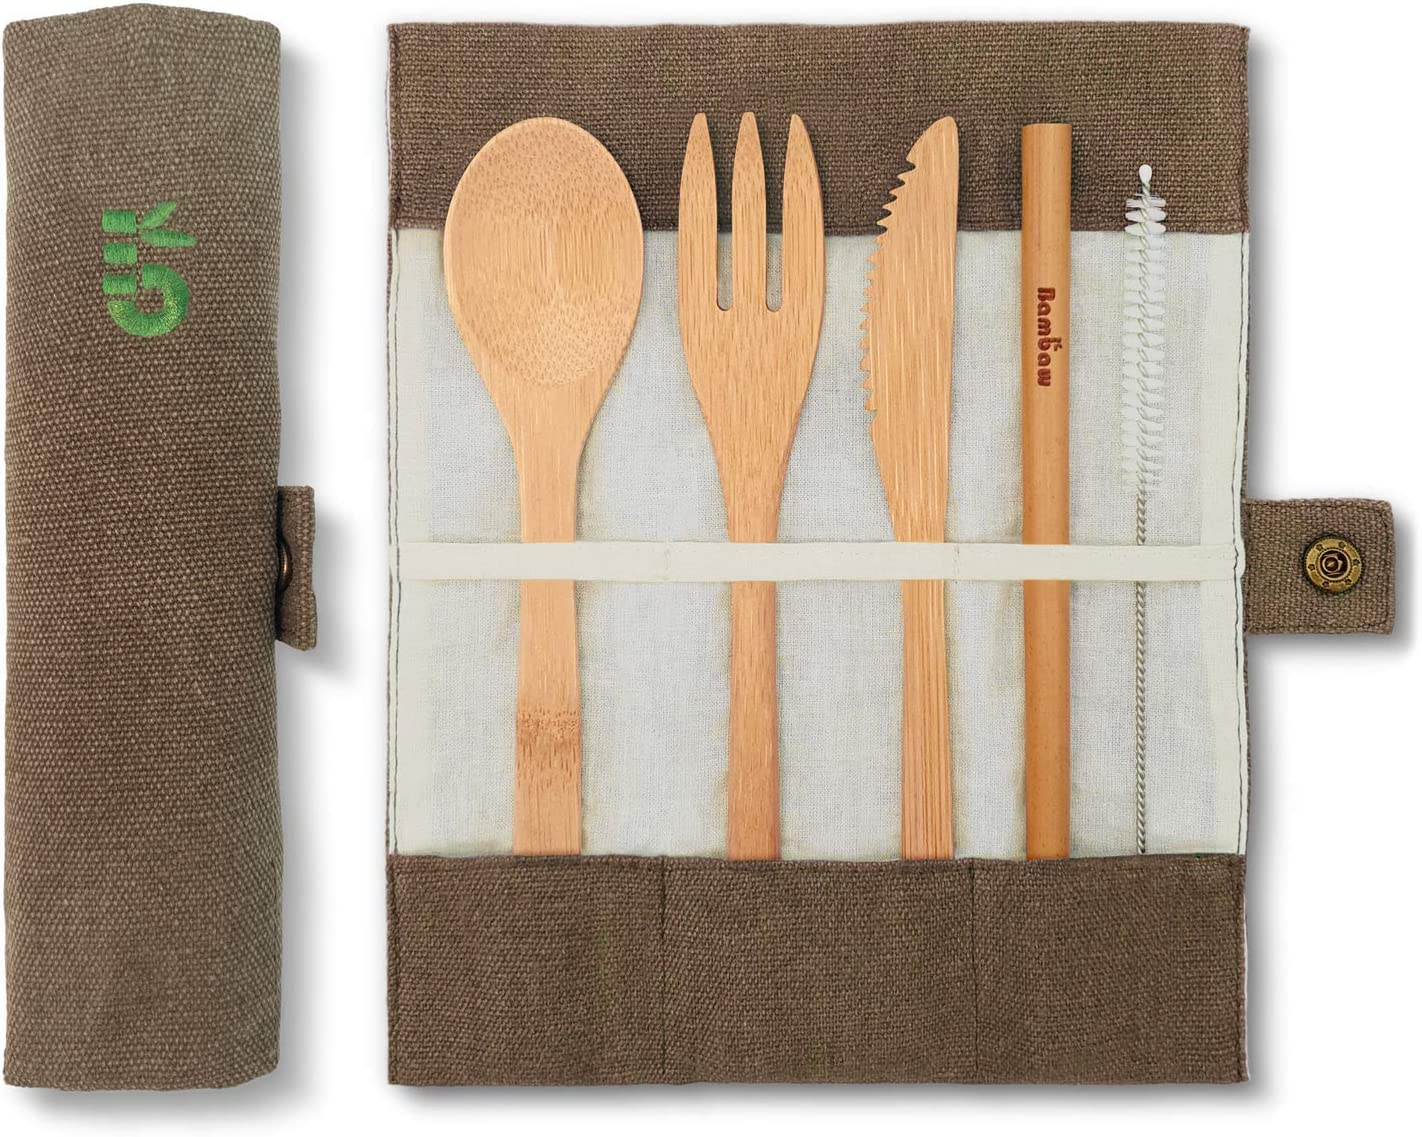 Cubierto de bambú | Cubiertos madera ecológicos |Utensilios madera | Set para picnic | Set cubiertos para camping | Cucharada, tenedor, cuchillo, pajita | 20 cm | Verde Oliva |Bambaw